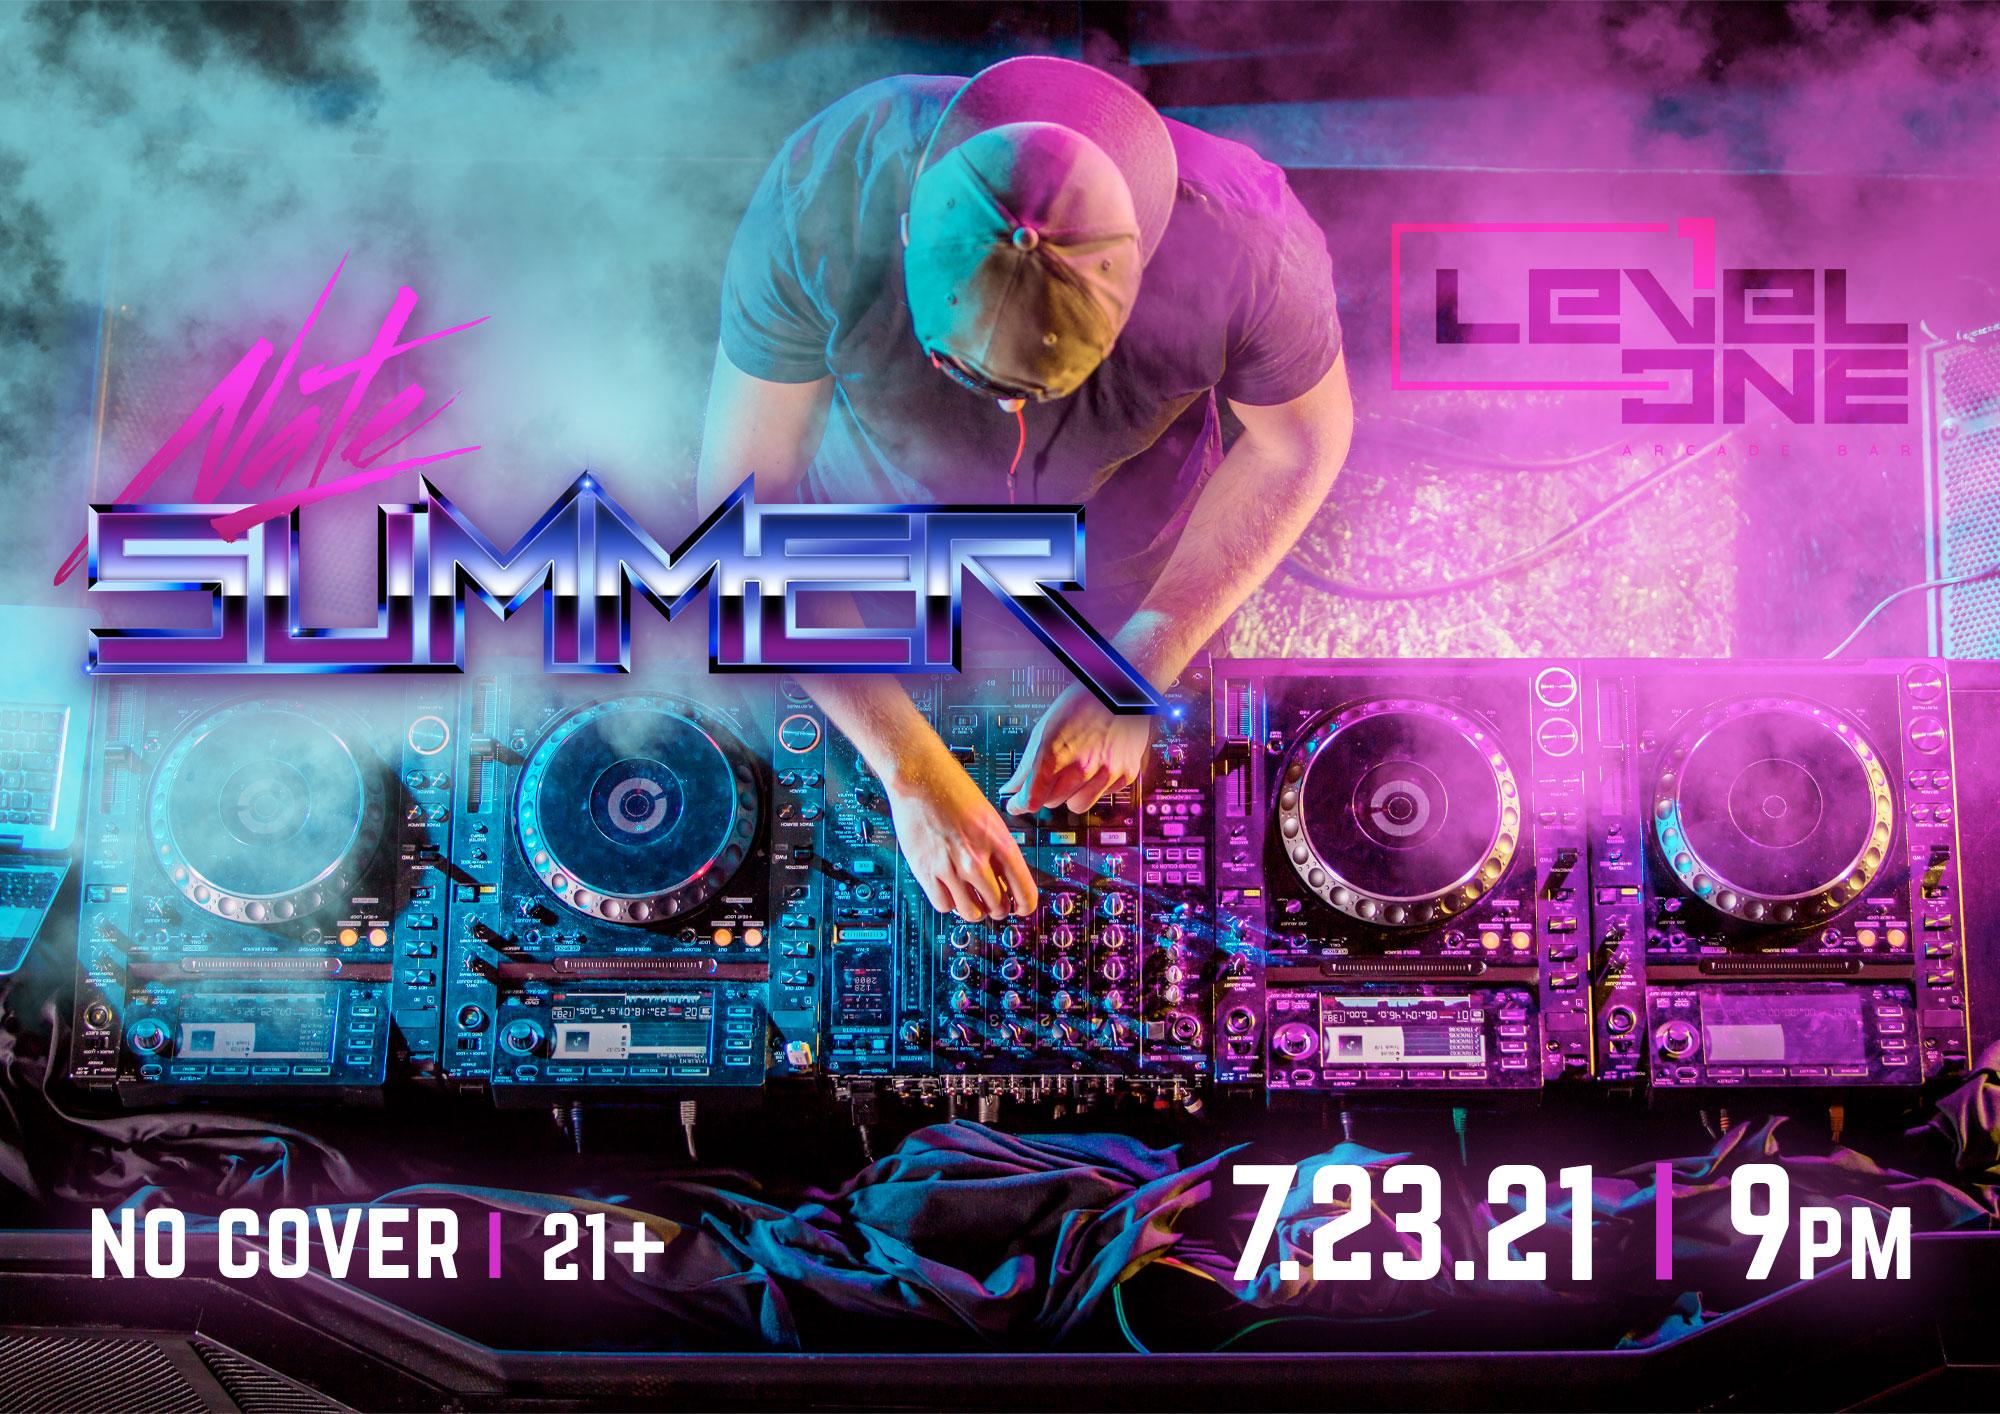 DJ Nate Summer